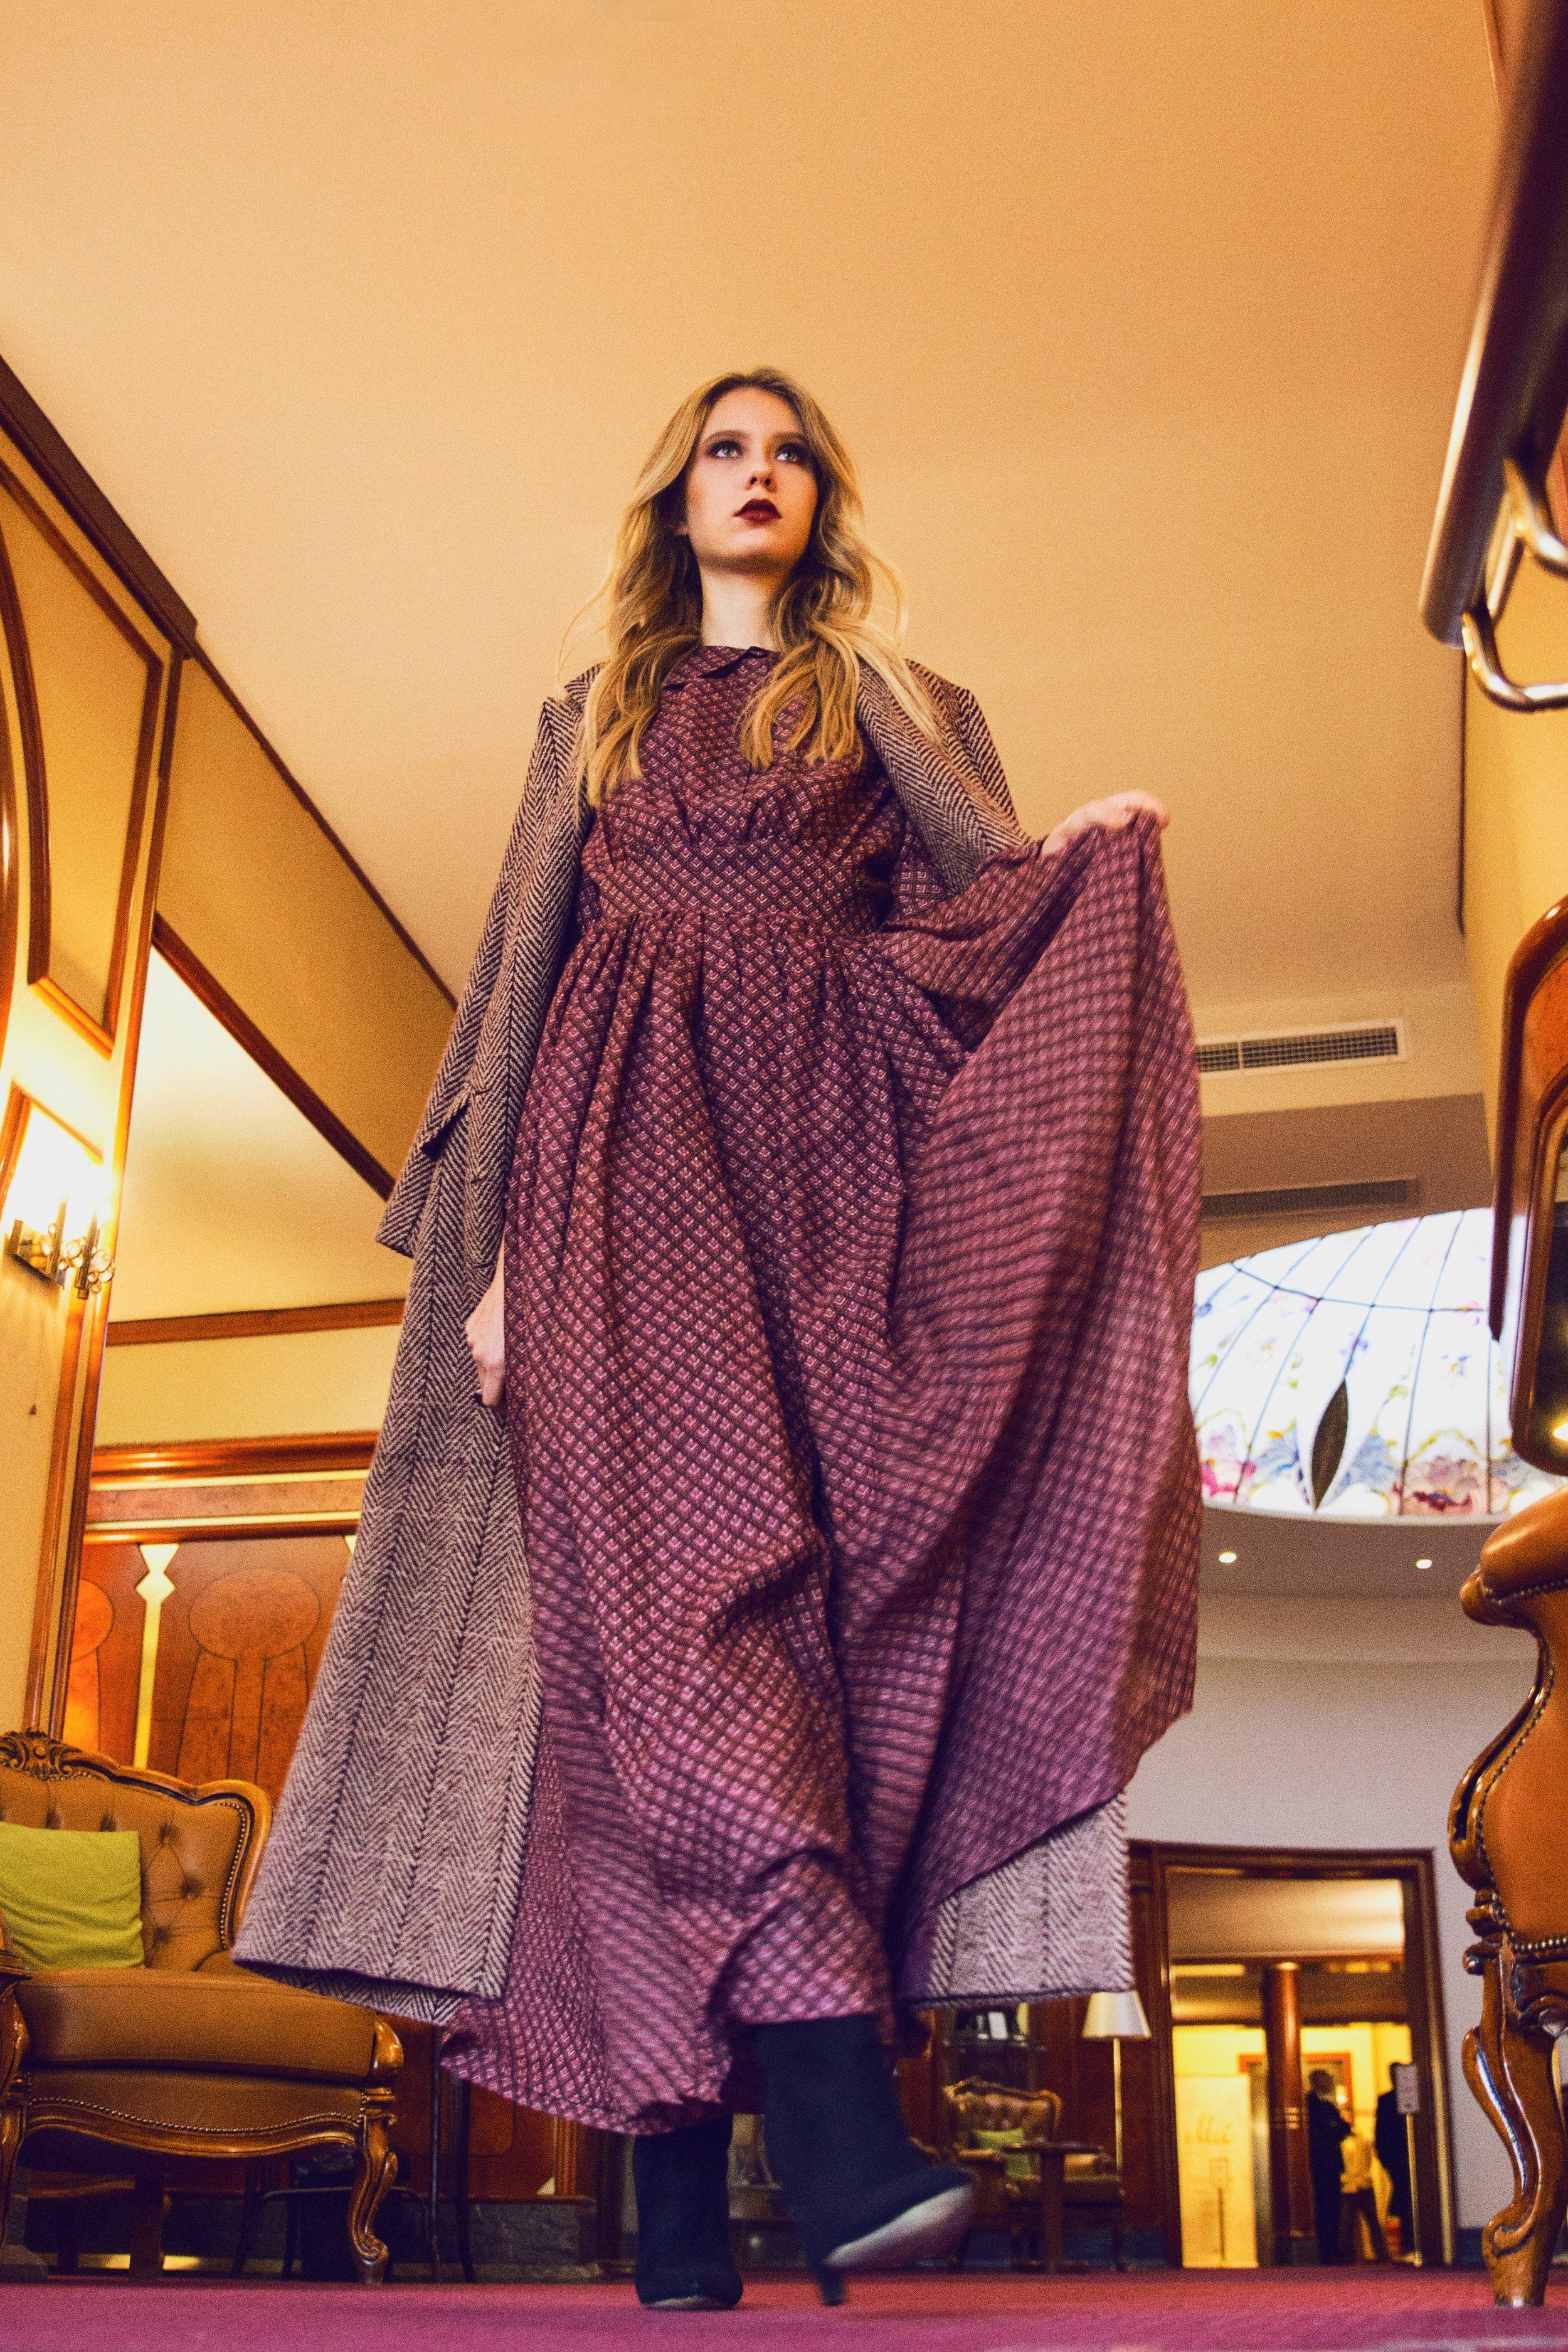 luka-lajic-fashion-photography-joliehr-hotel-palace-anamaria-ricov-robert-sever-loreta-gudelj-shoebox-talia-models (9).jpg